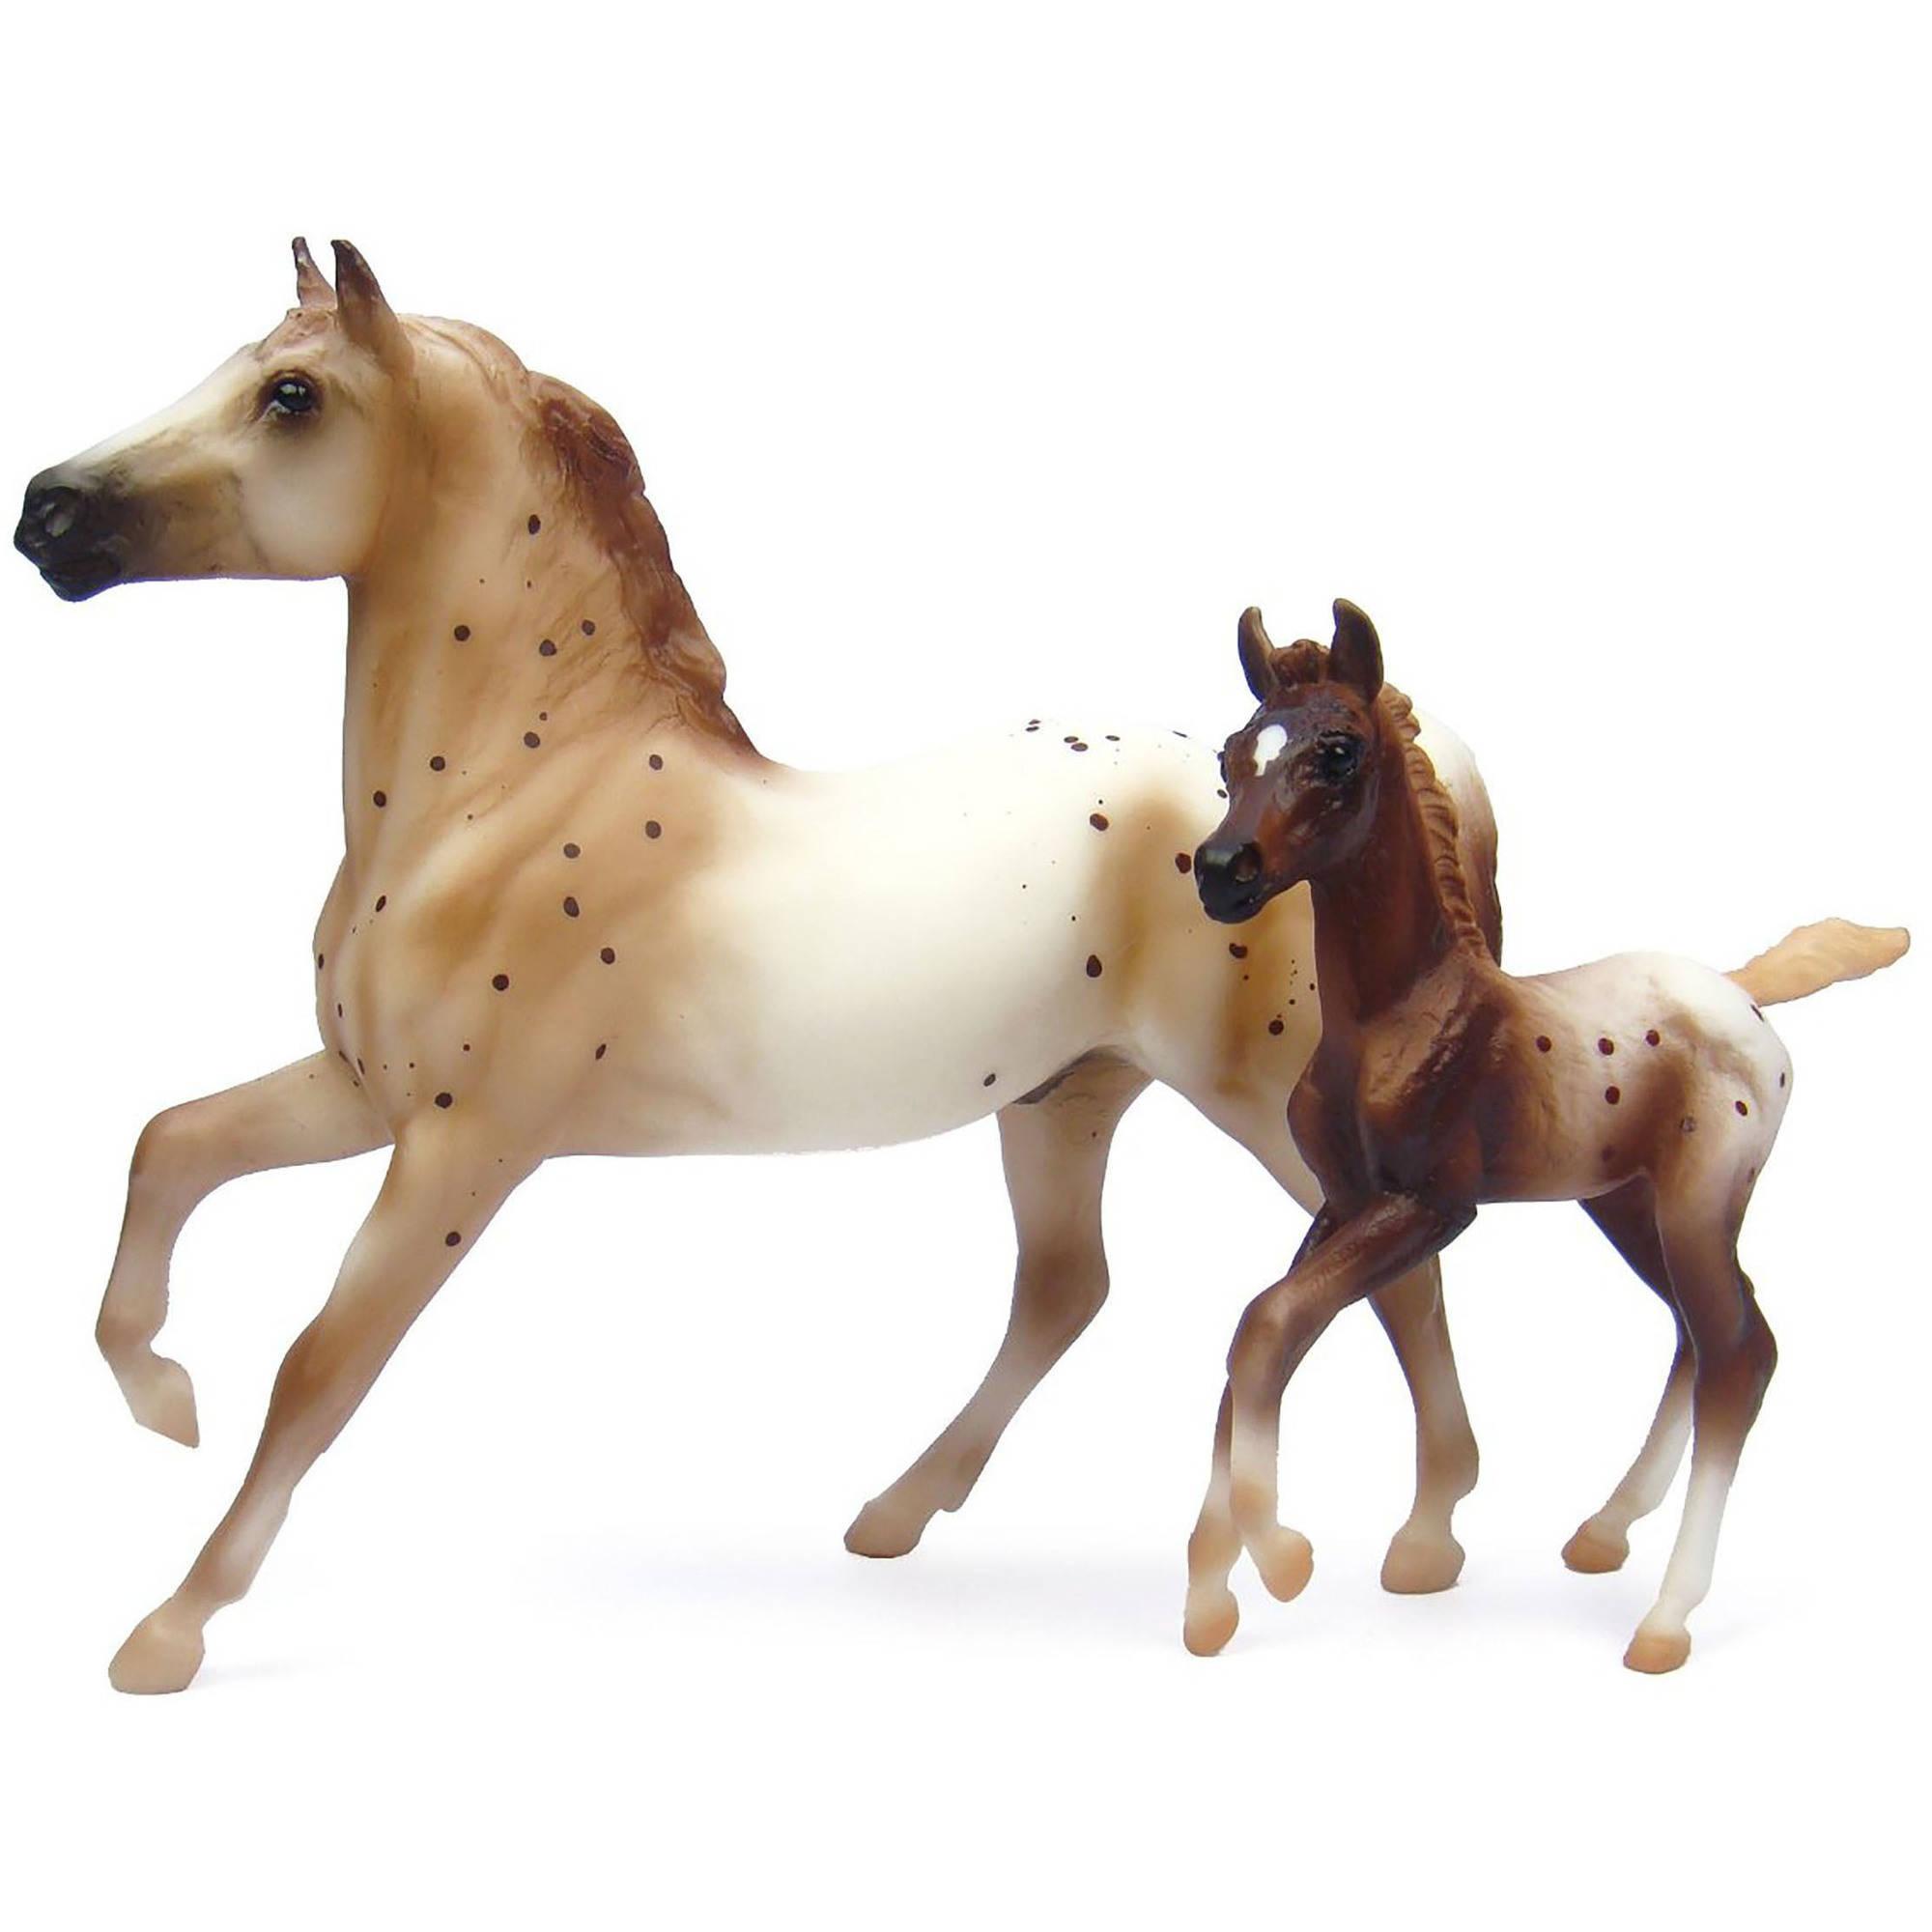 Breyer Classics Chestnut Semi-Leopard Appaloosa Stallion and Chestnut Blanket Appaloosa Foal Model Horses